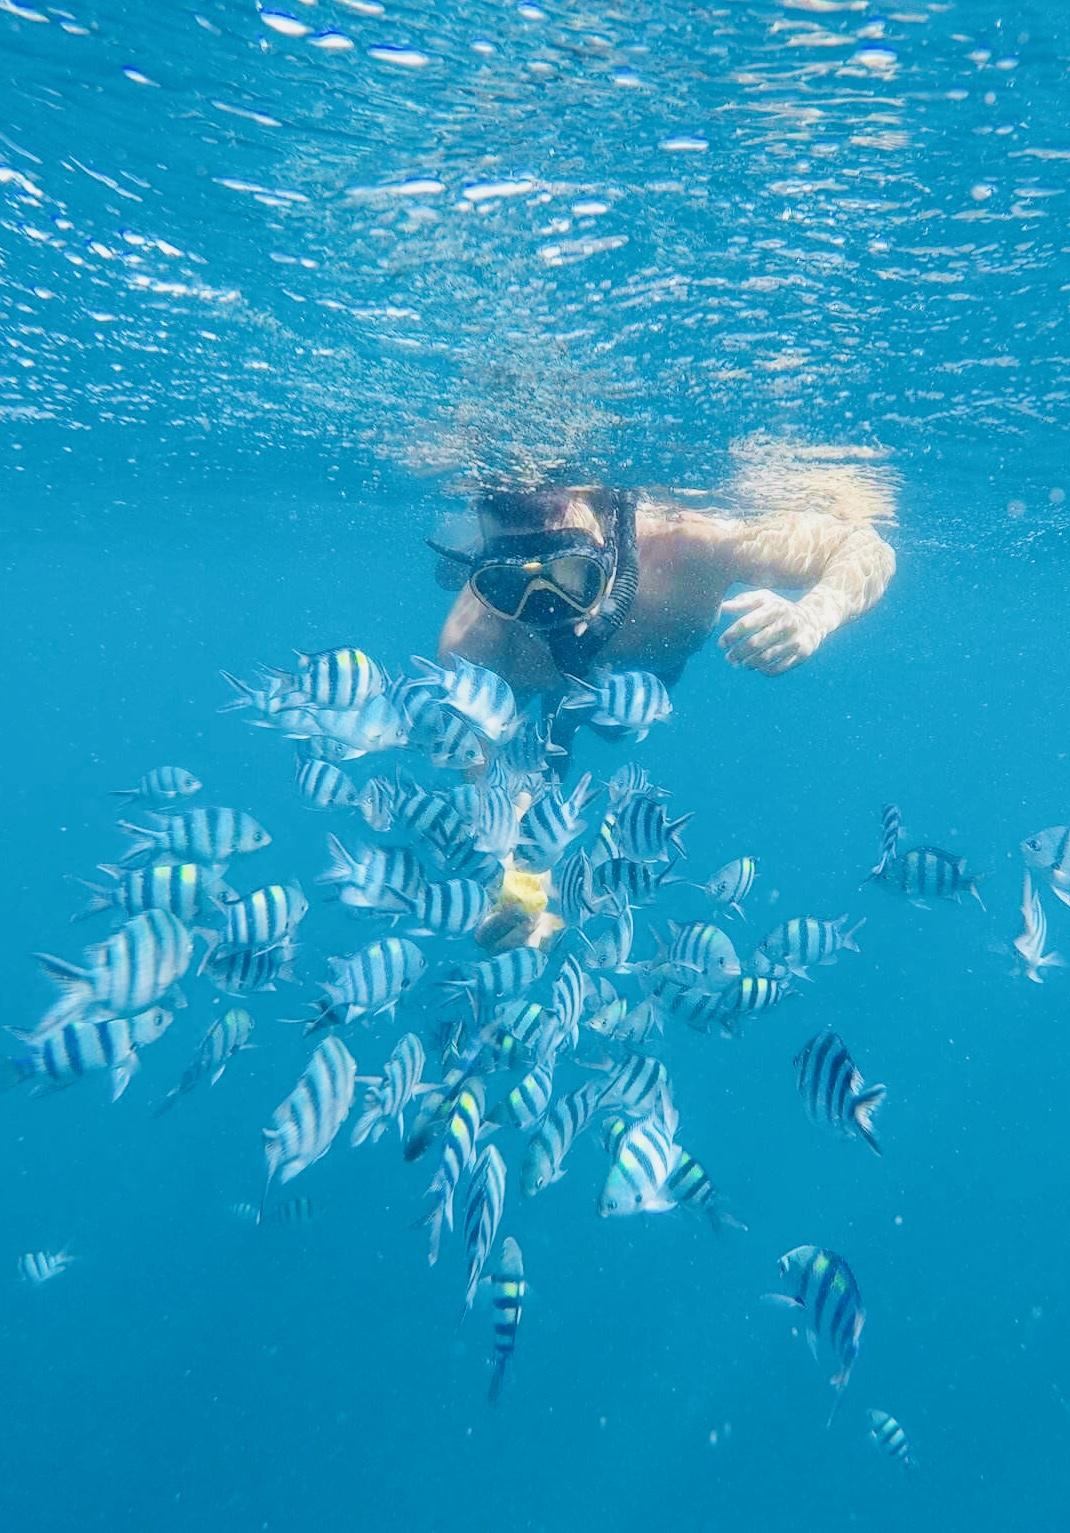 Buhay Isla snorkeling.jpg